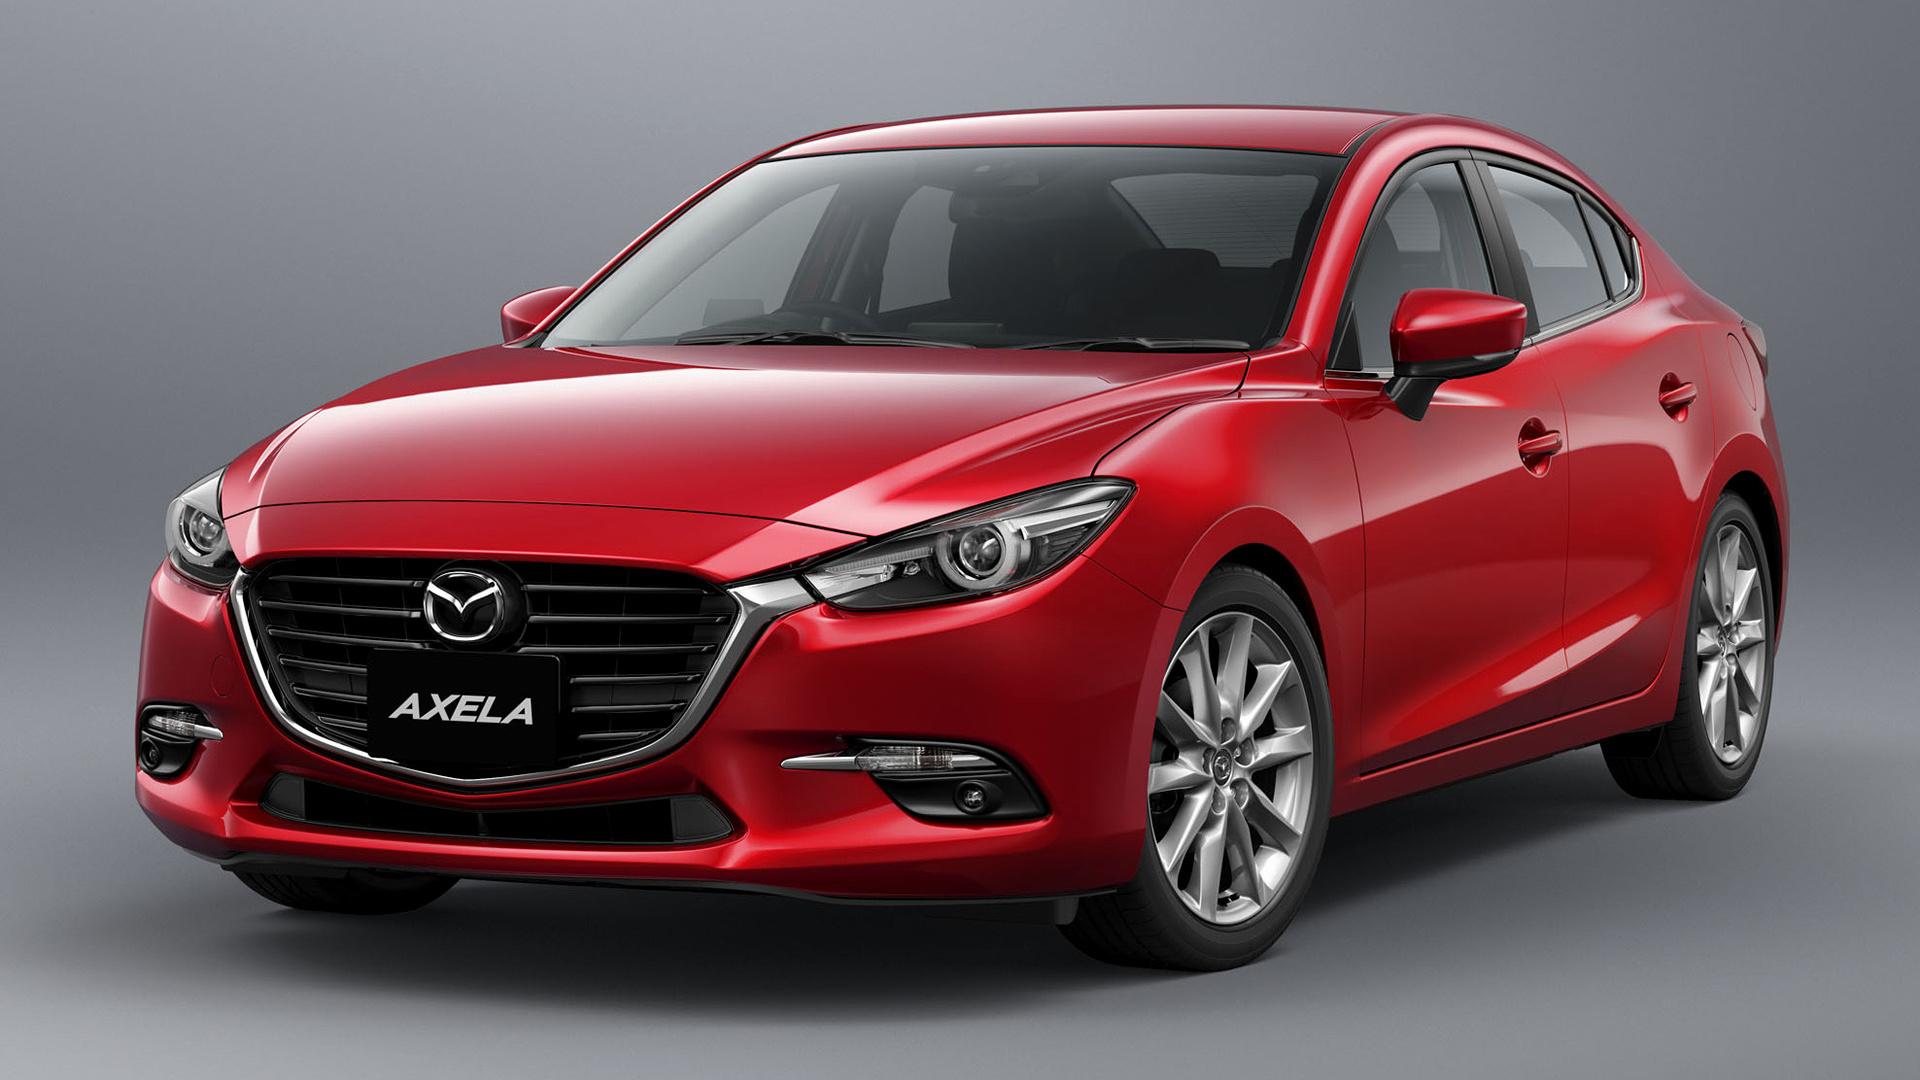 2016 Mazda Axela Sedan Wallpapers And Hd Images Car Pixel